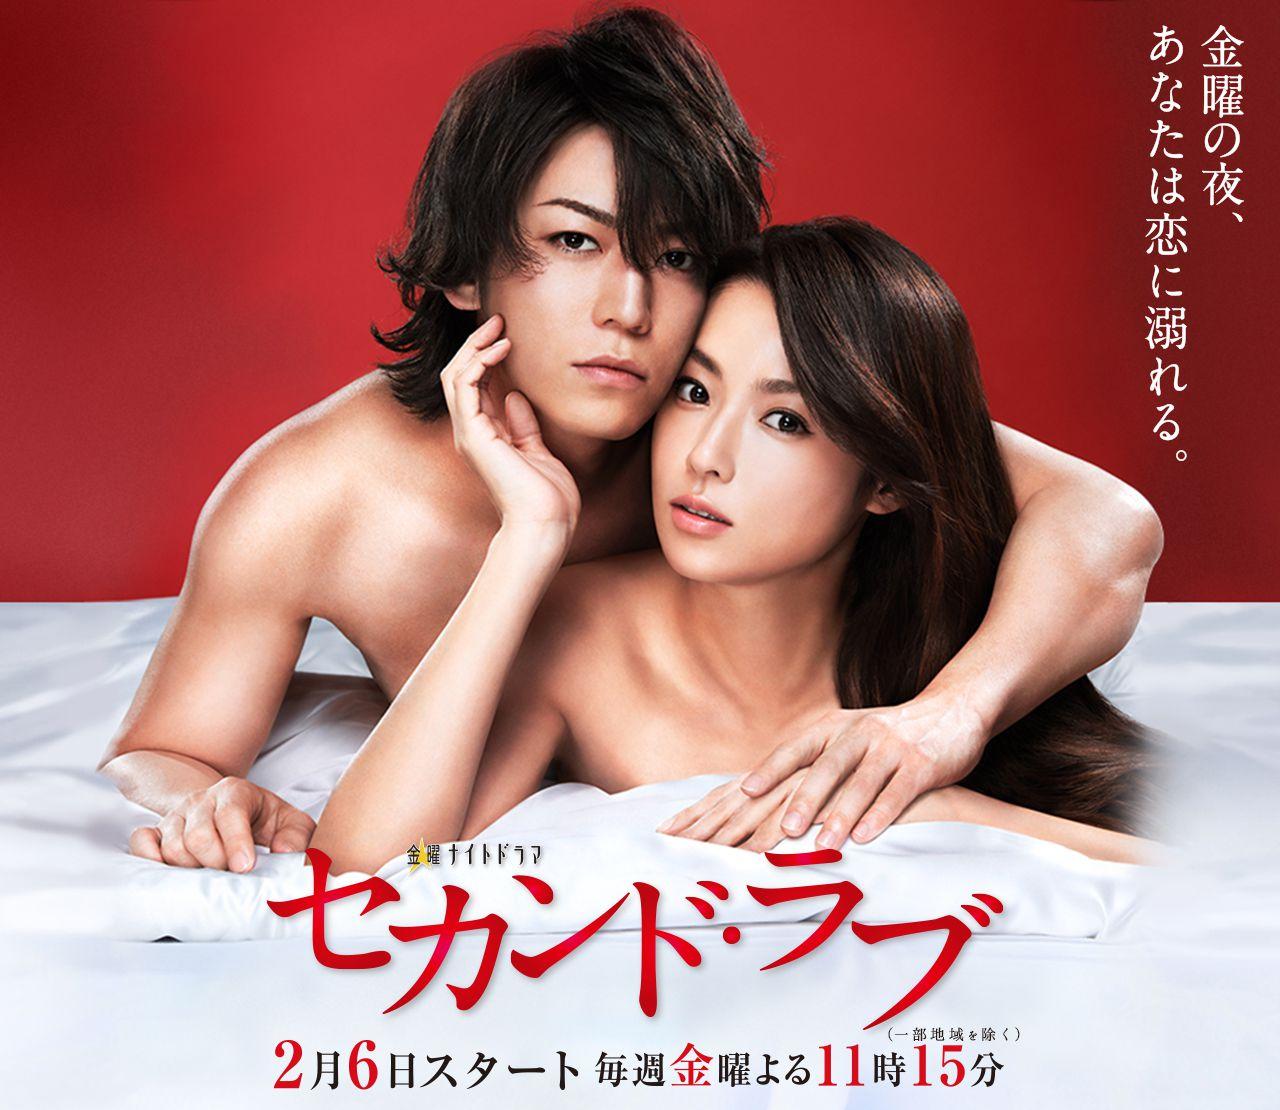 Second_Love-p1.jpg